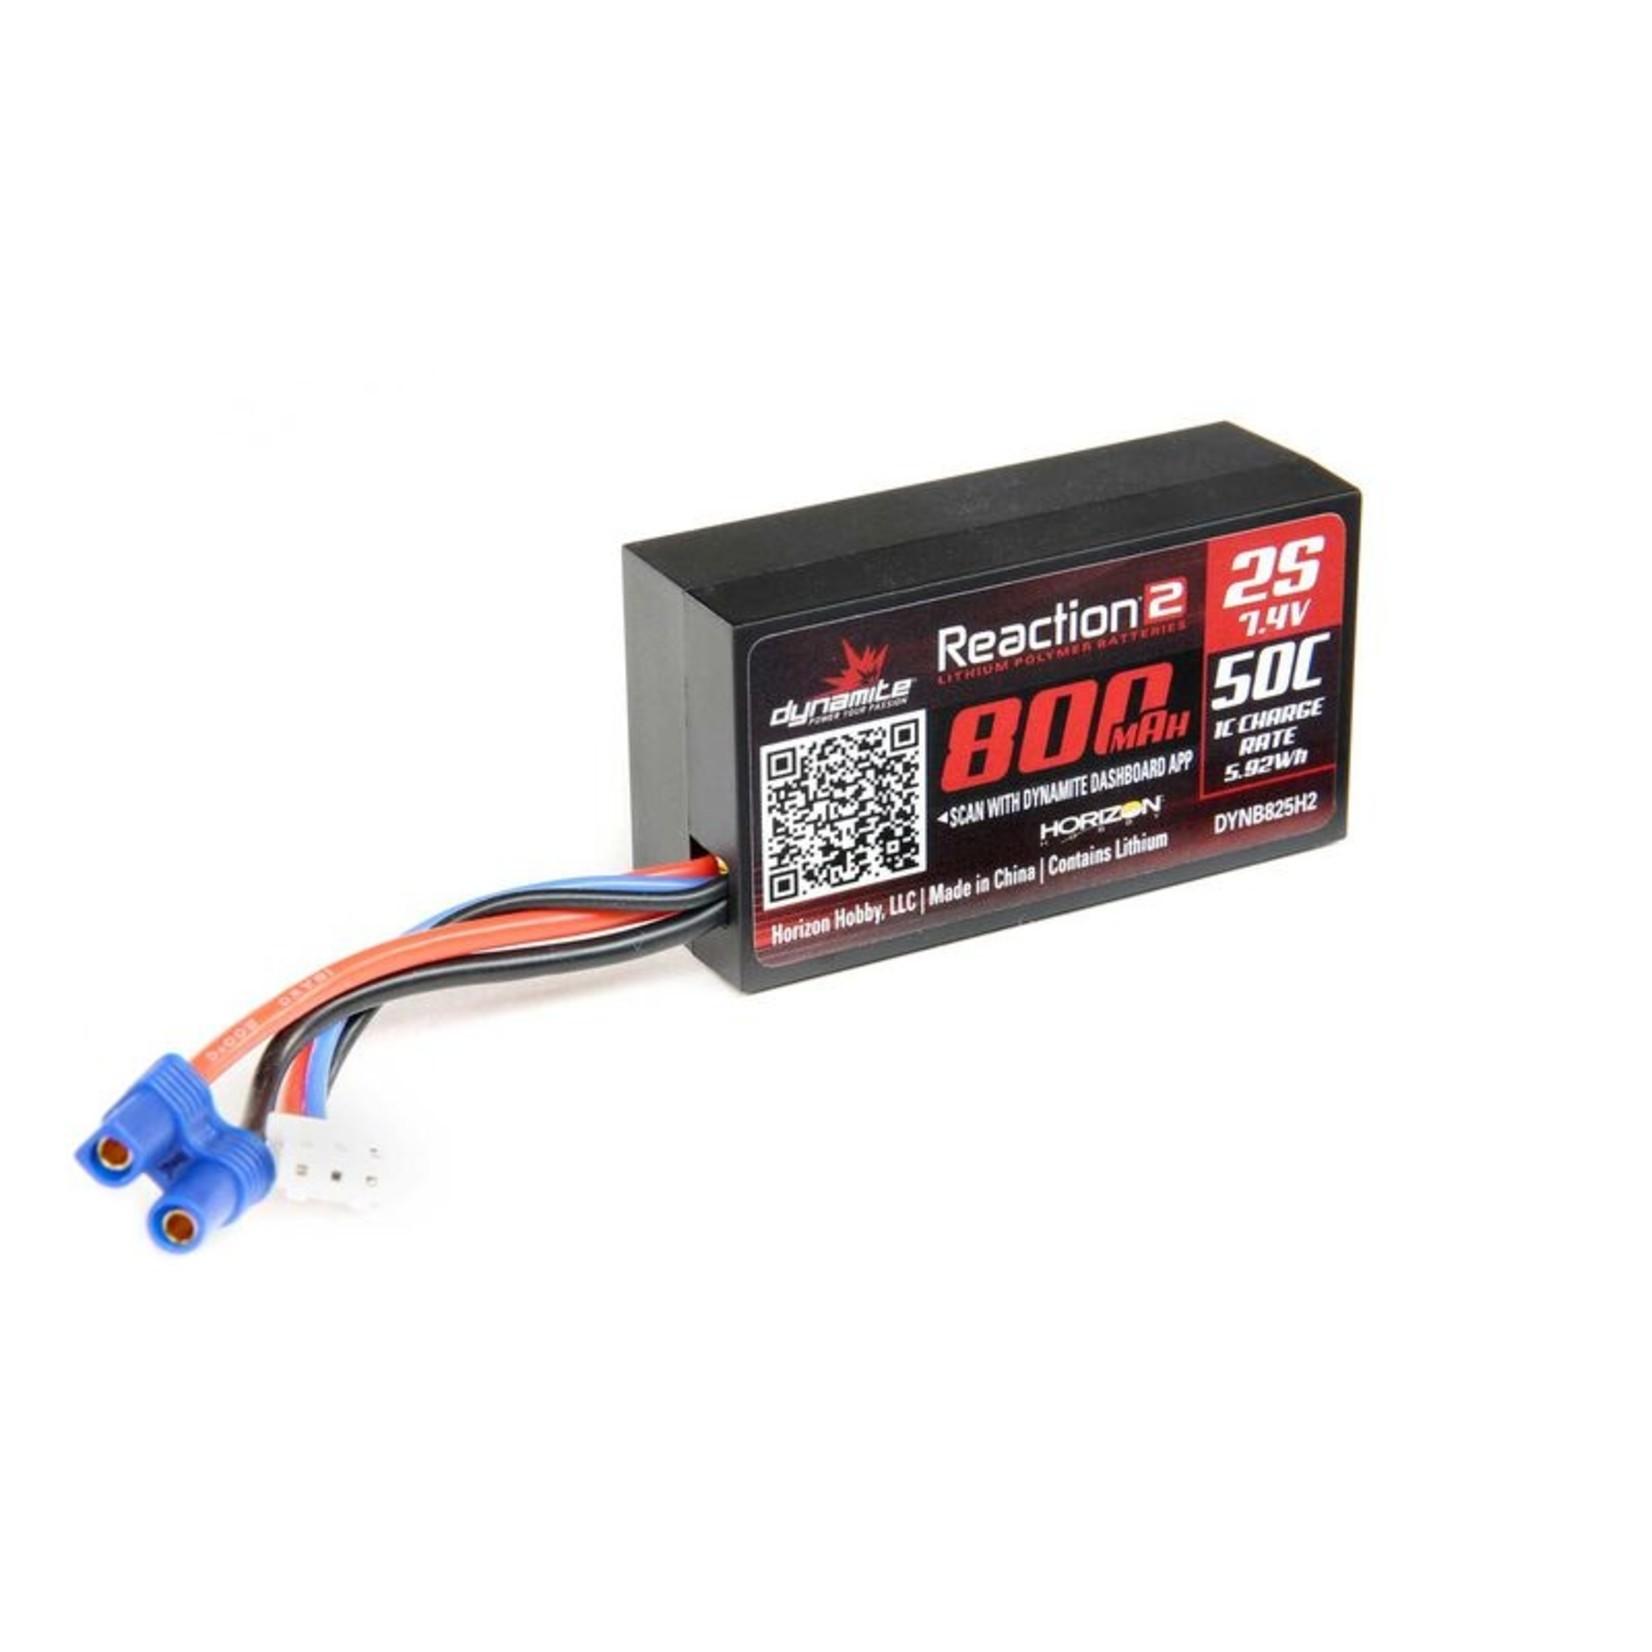 Dynamite DYNB825H2 Dynamite 7.4V 800mAh 2S 50C Hardcase LiPo Battery: EC2